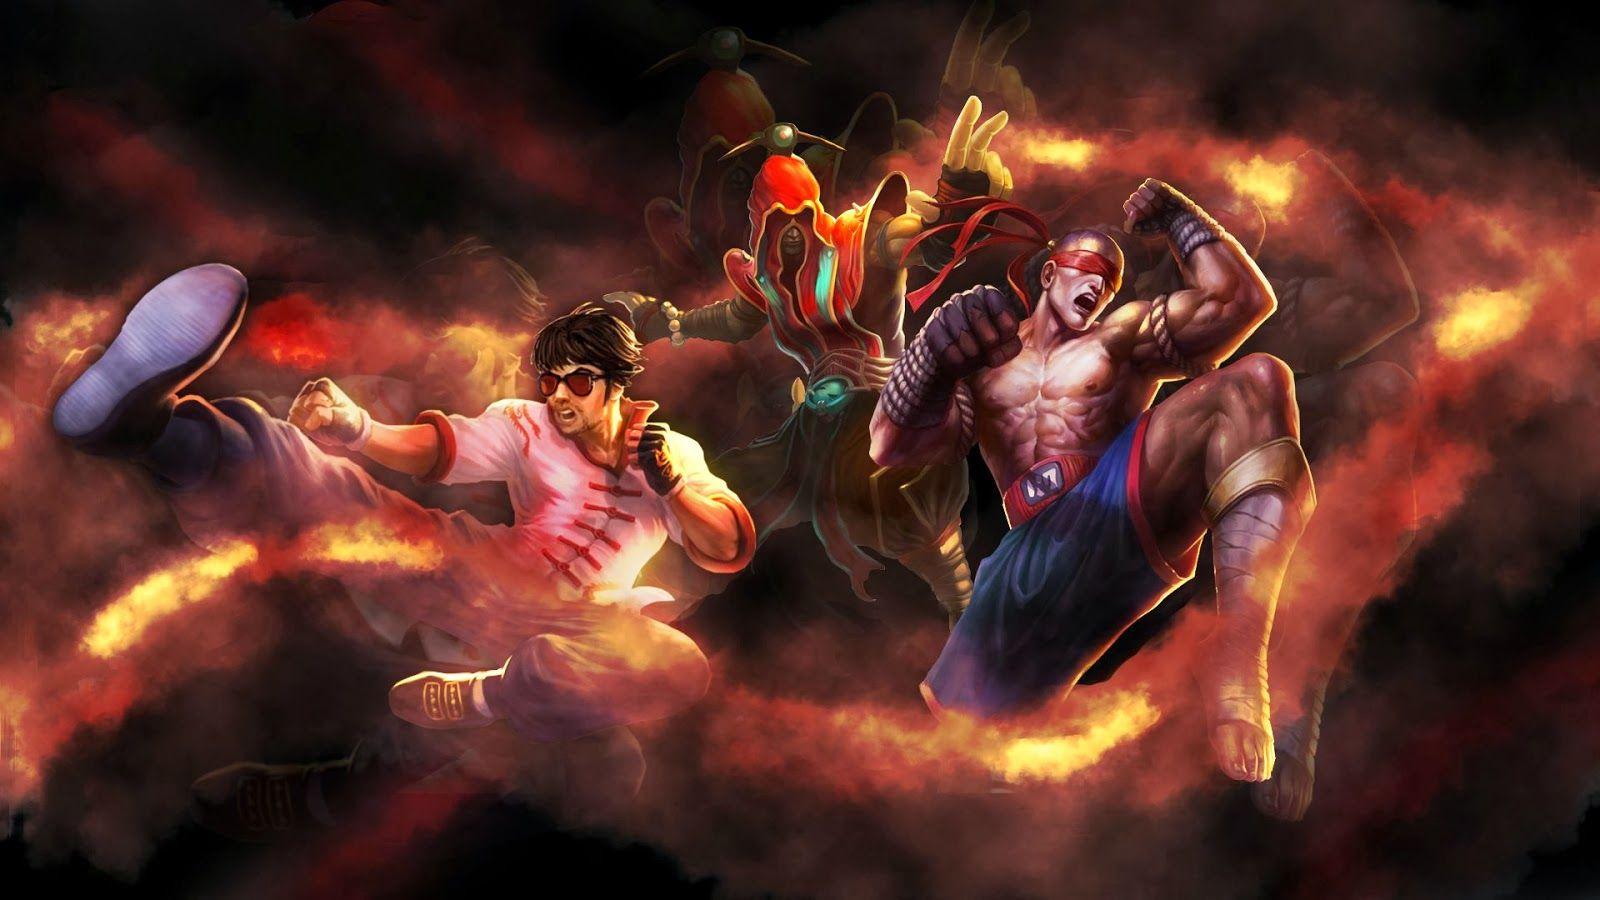 League Of Legends Lee Sin Wallpaper High Quality League Of Legends League Of Legends Video Play League Of Legends